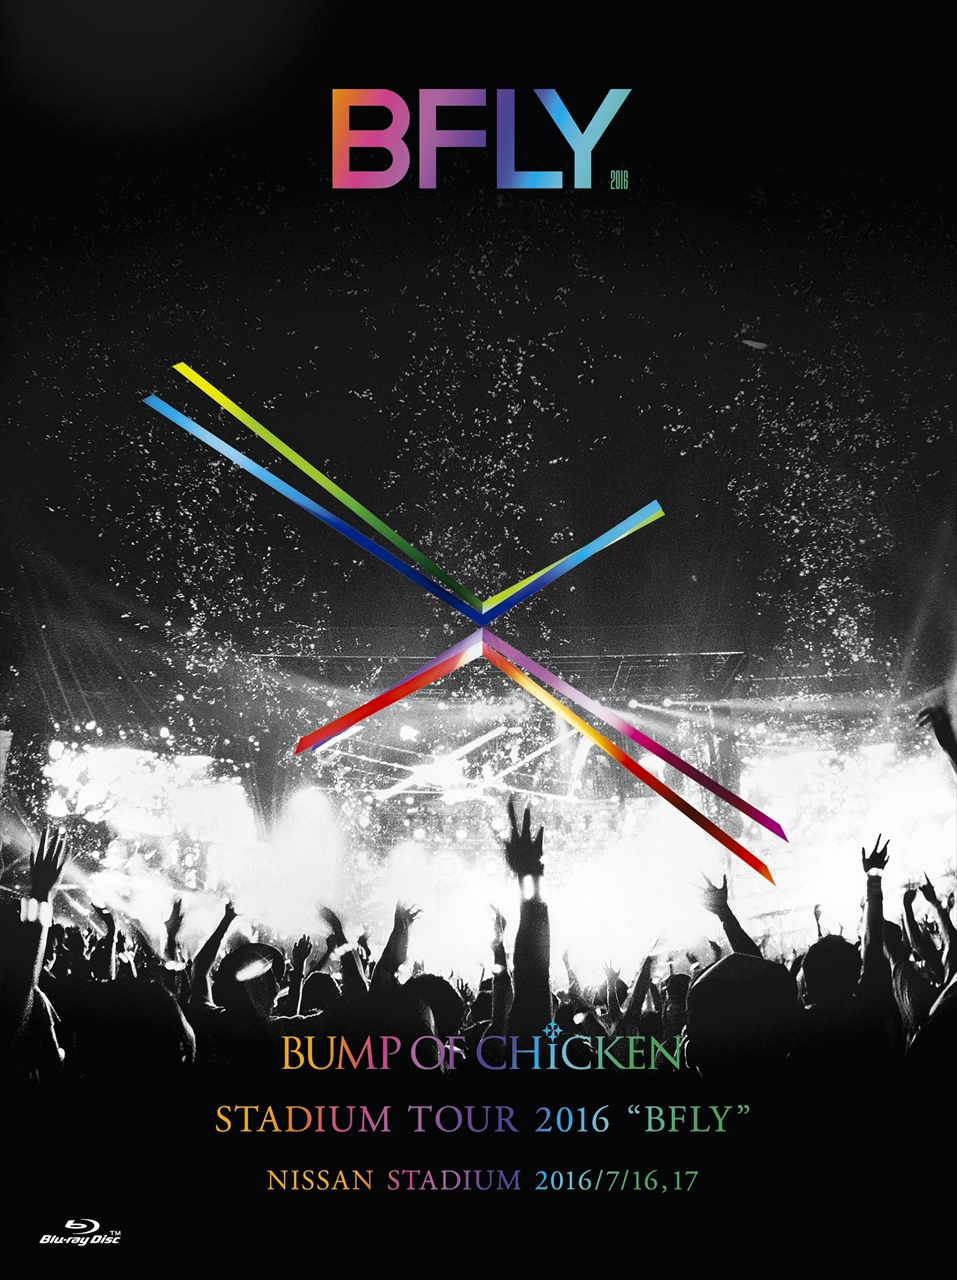 "BUMP OF CHICKEN STADIUM TOUR 2016 ""BFLY"" NISSAN STADIUM 2016/7/16, 17"